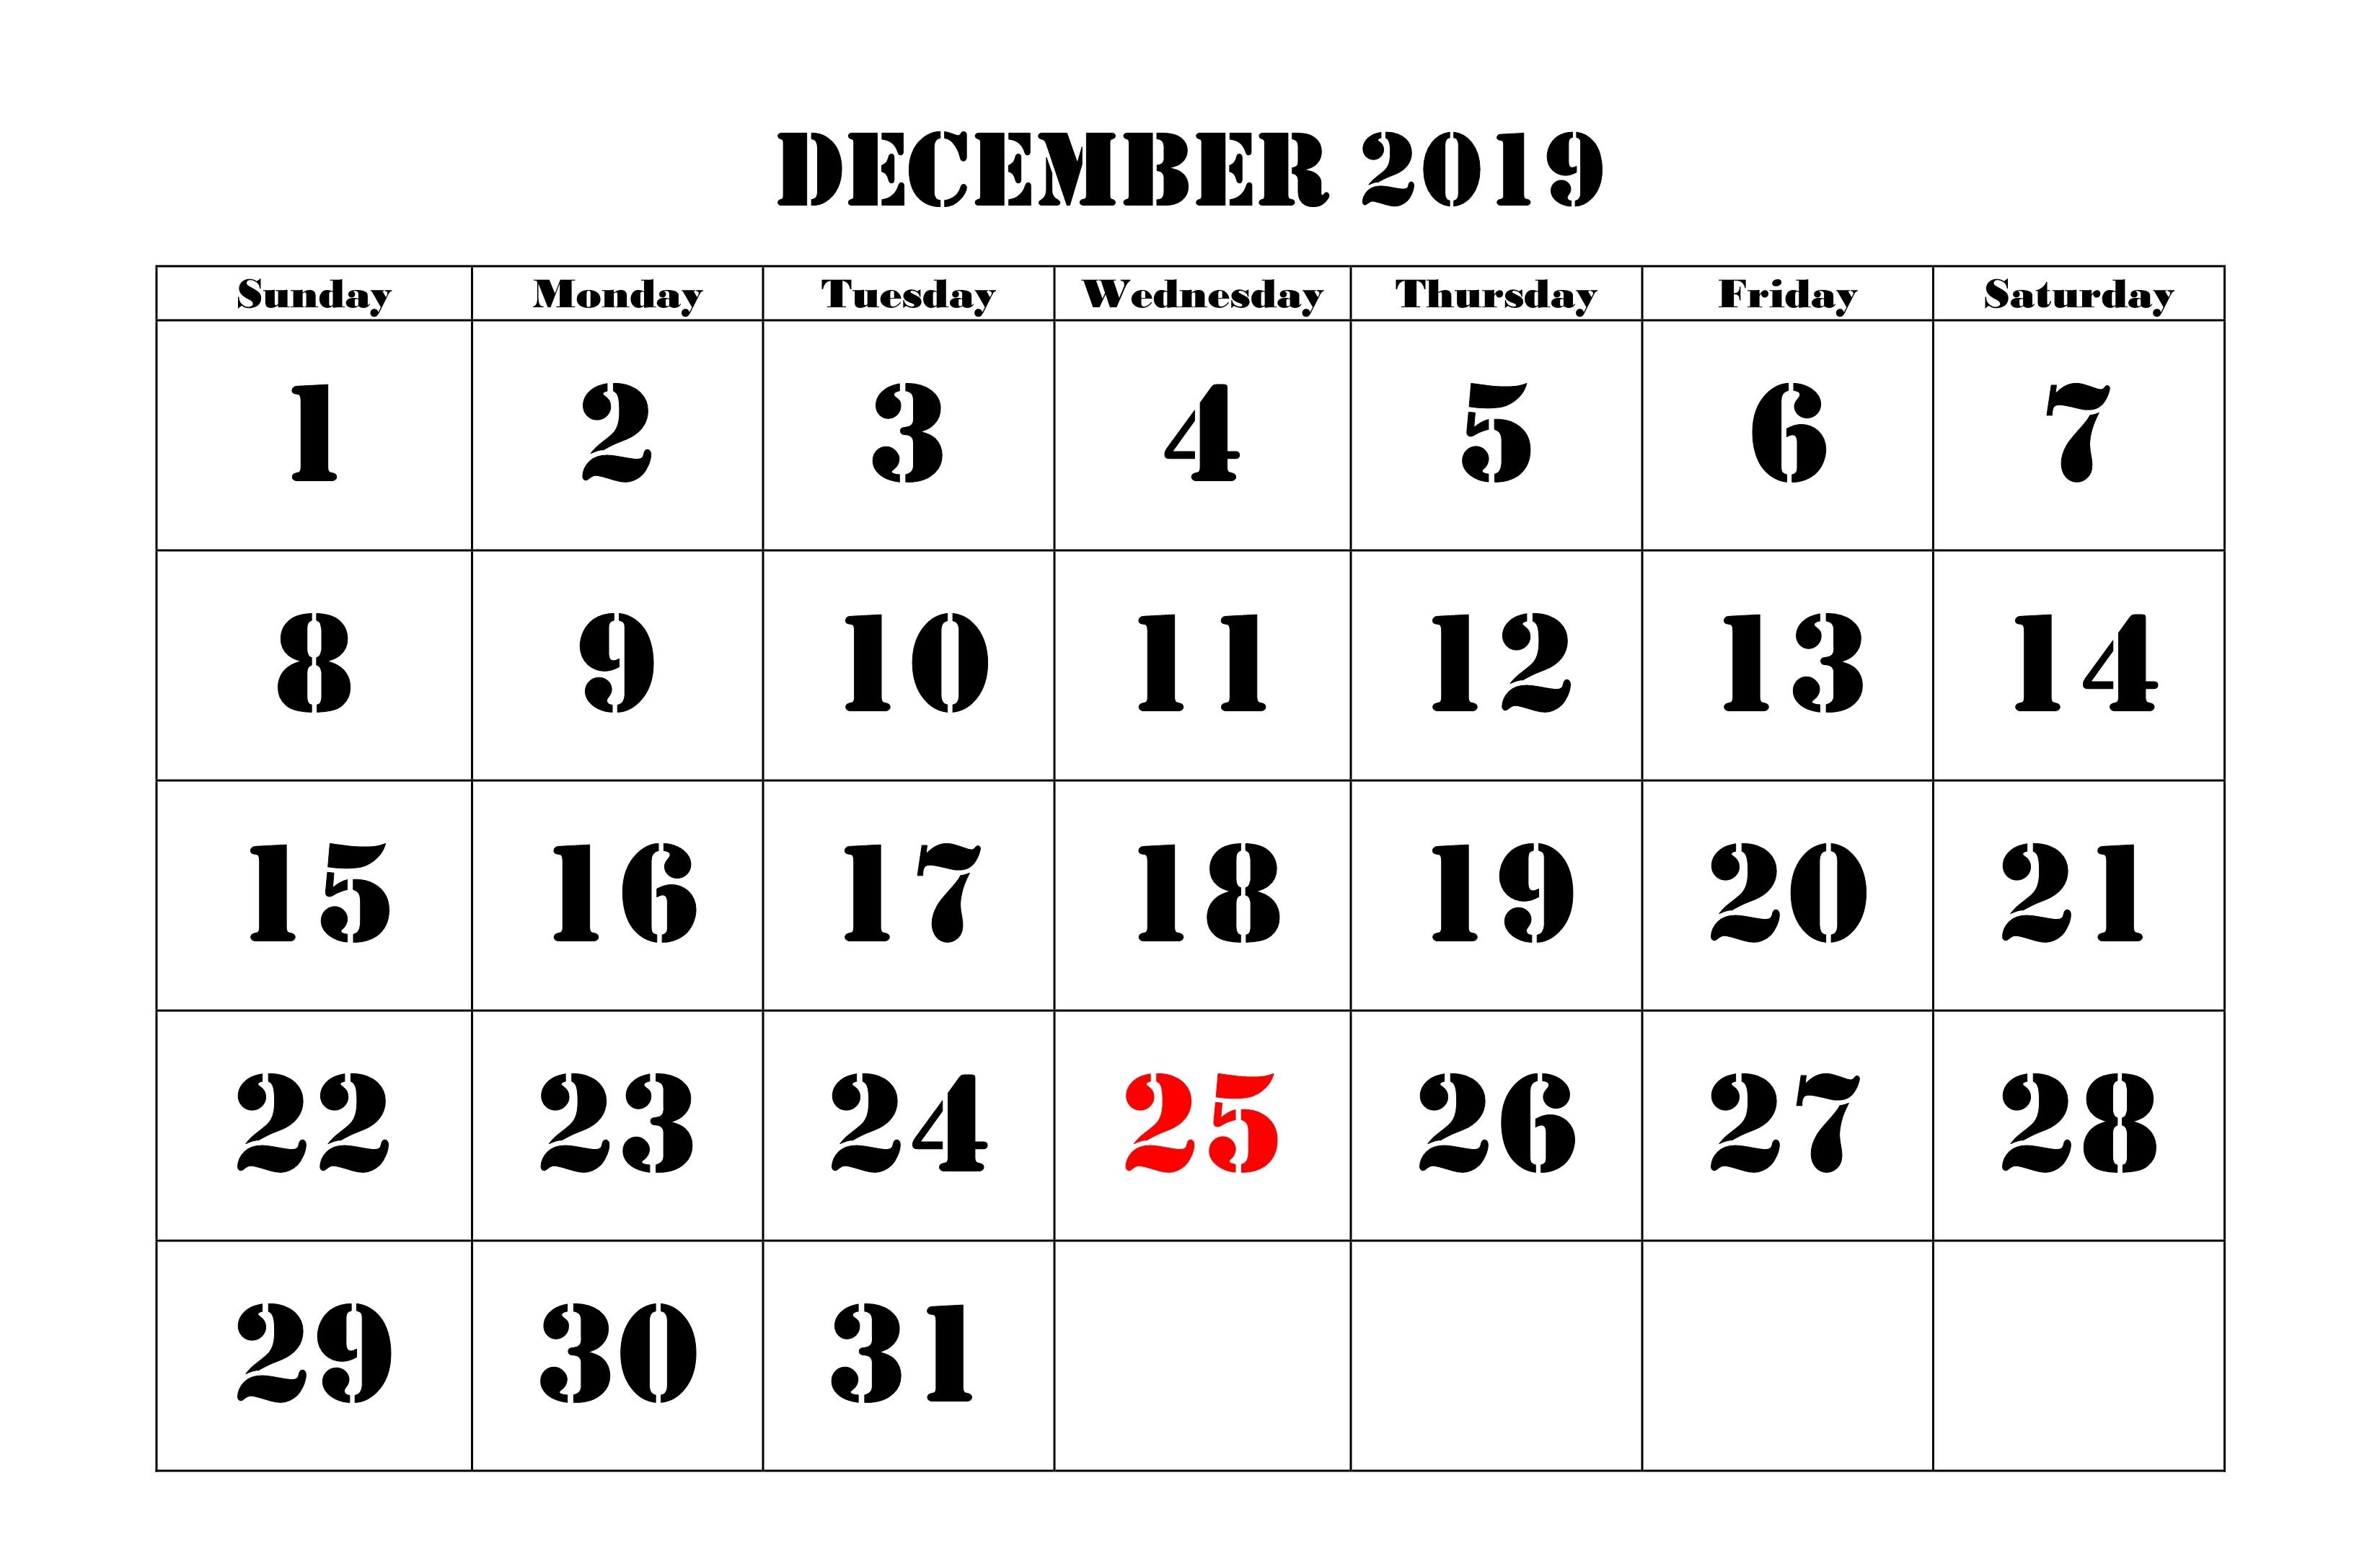 Holidays Calendar of December 2019 India